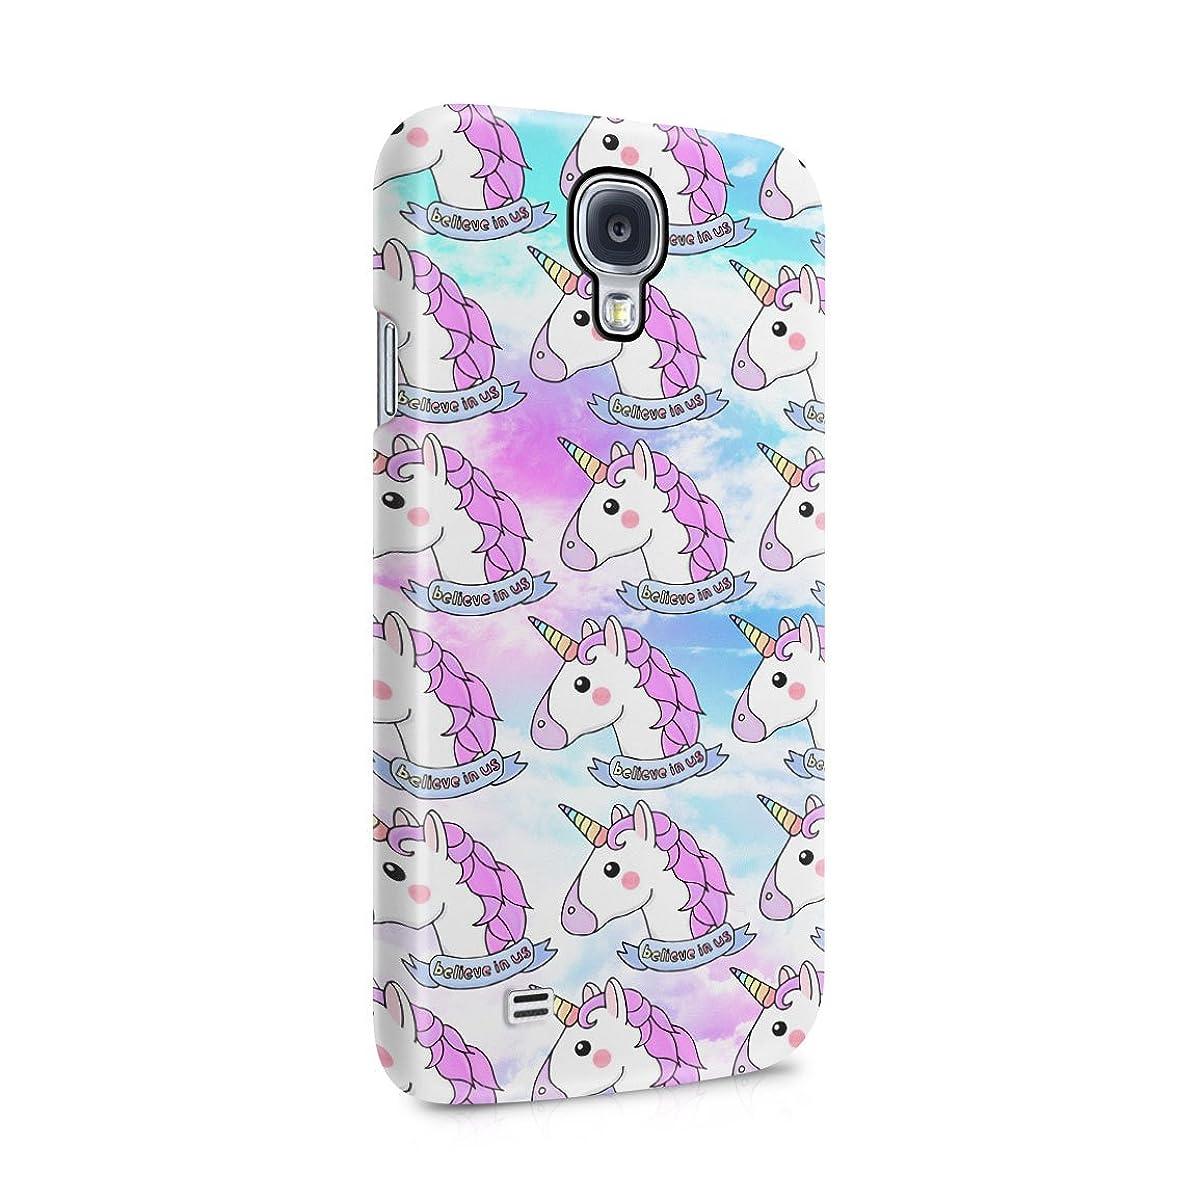 Unicorn Heads Pattern Believe In Us Hard Plastic Phone Case For Samsung Galaxy S4